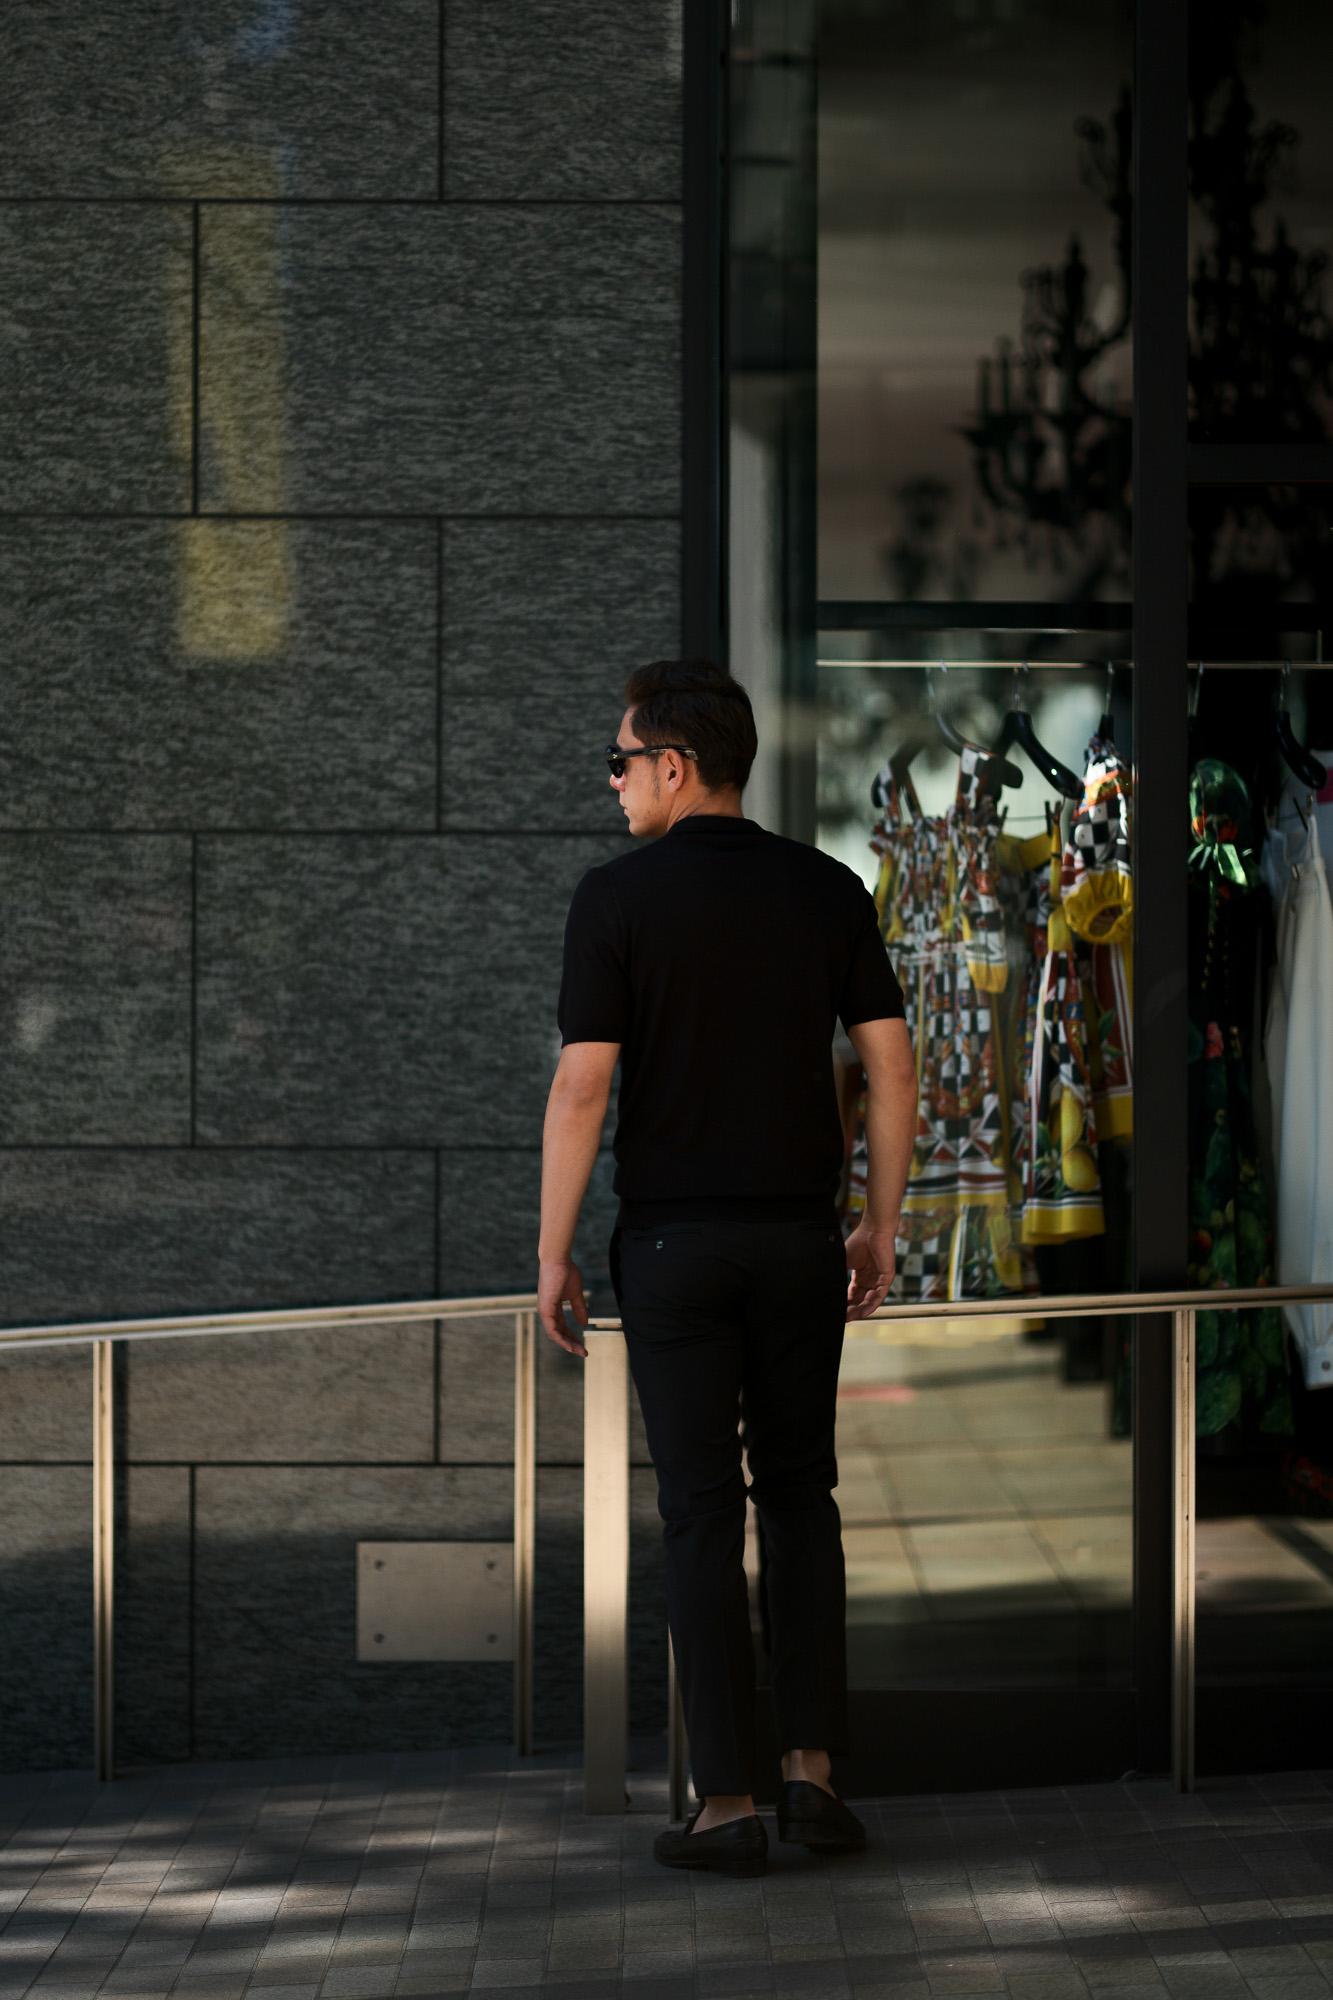 Gran Sasso (グランサッソ) Silk Knit Polo Shirt (シルクニット) SETA (シルク 100%) シルク ニット ポロシャツ BLACK (ブラック・099) made in italy (イタリア製) 2019 春夏新作 gransasso 愛知 名古屋 altoediritto アルトエデリット